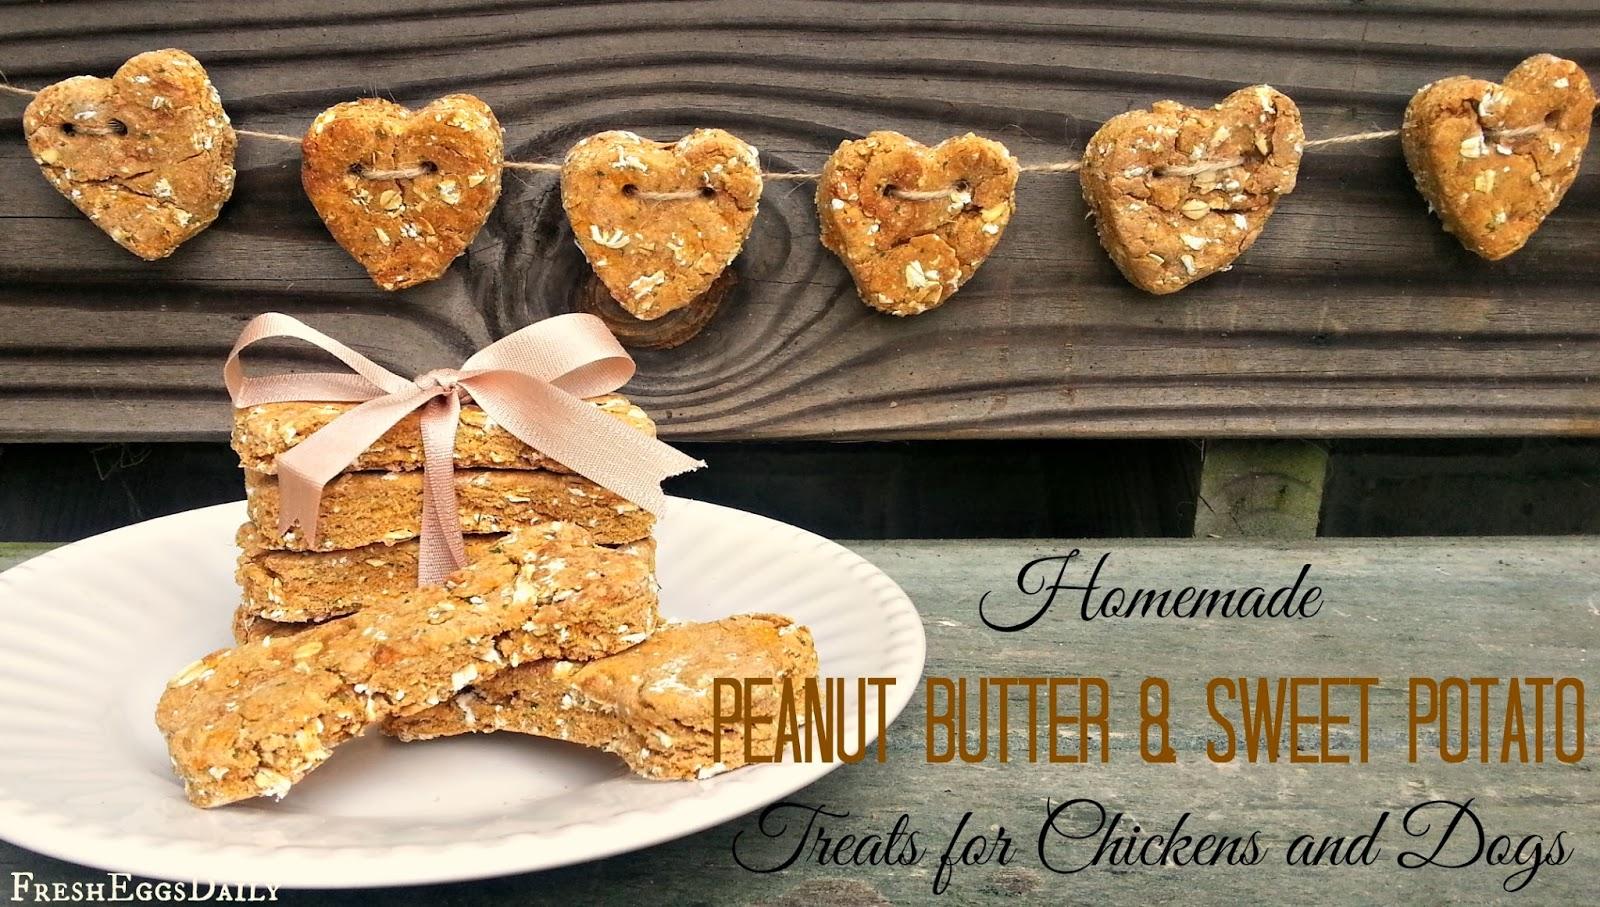 Homemade peanut butter and sweet potato treats for for Easy sweet treats with peanut butter